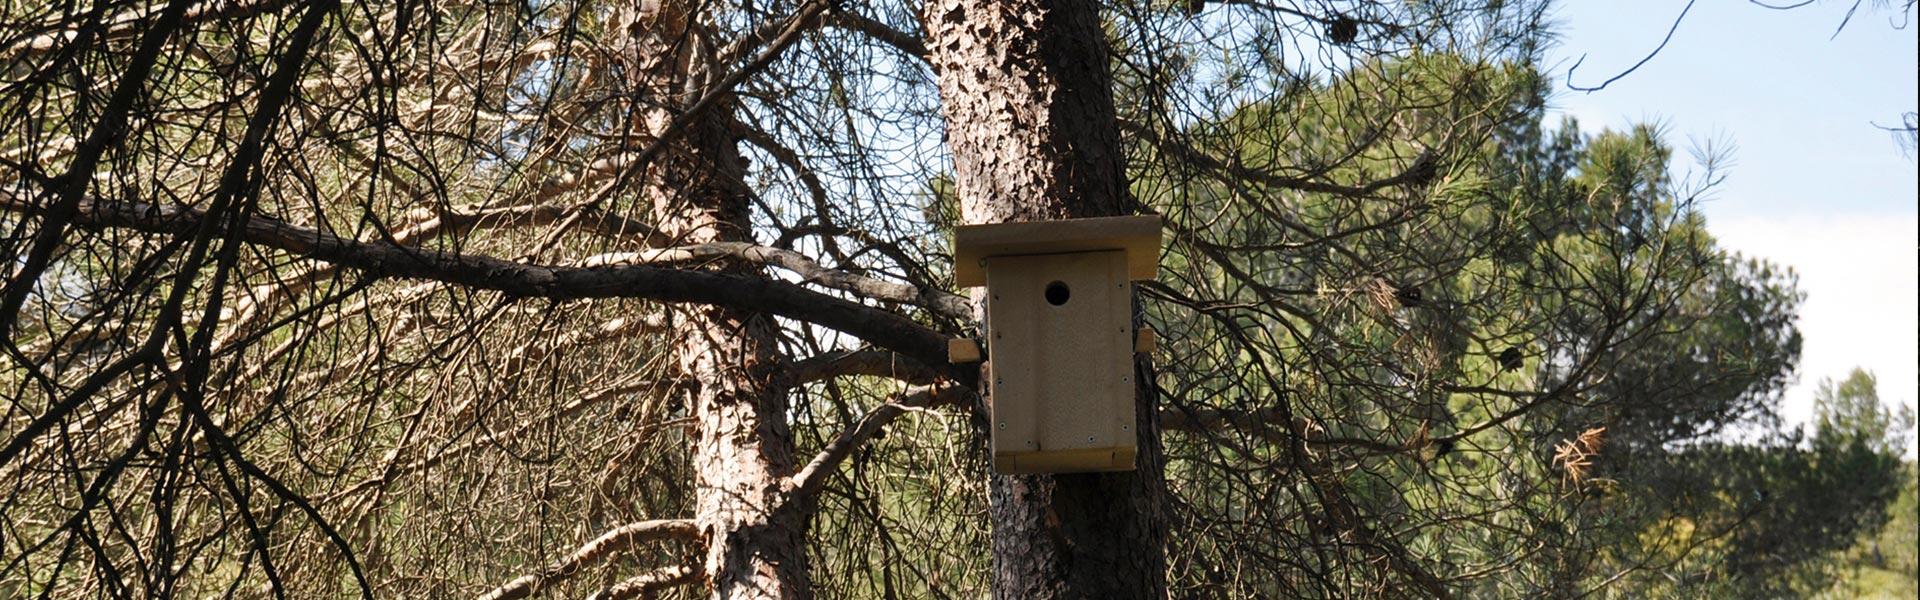 headbandeau-environnement-niche-arbre